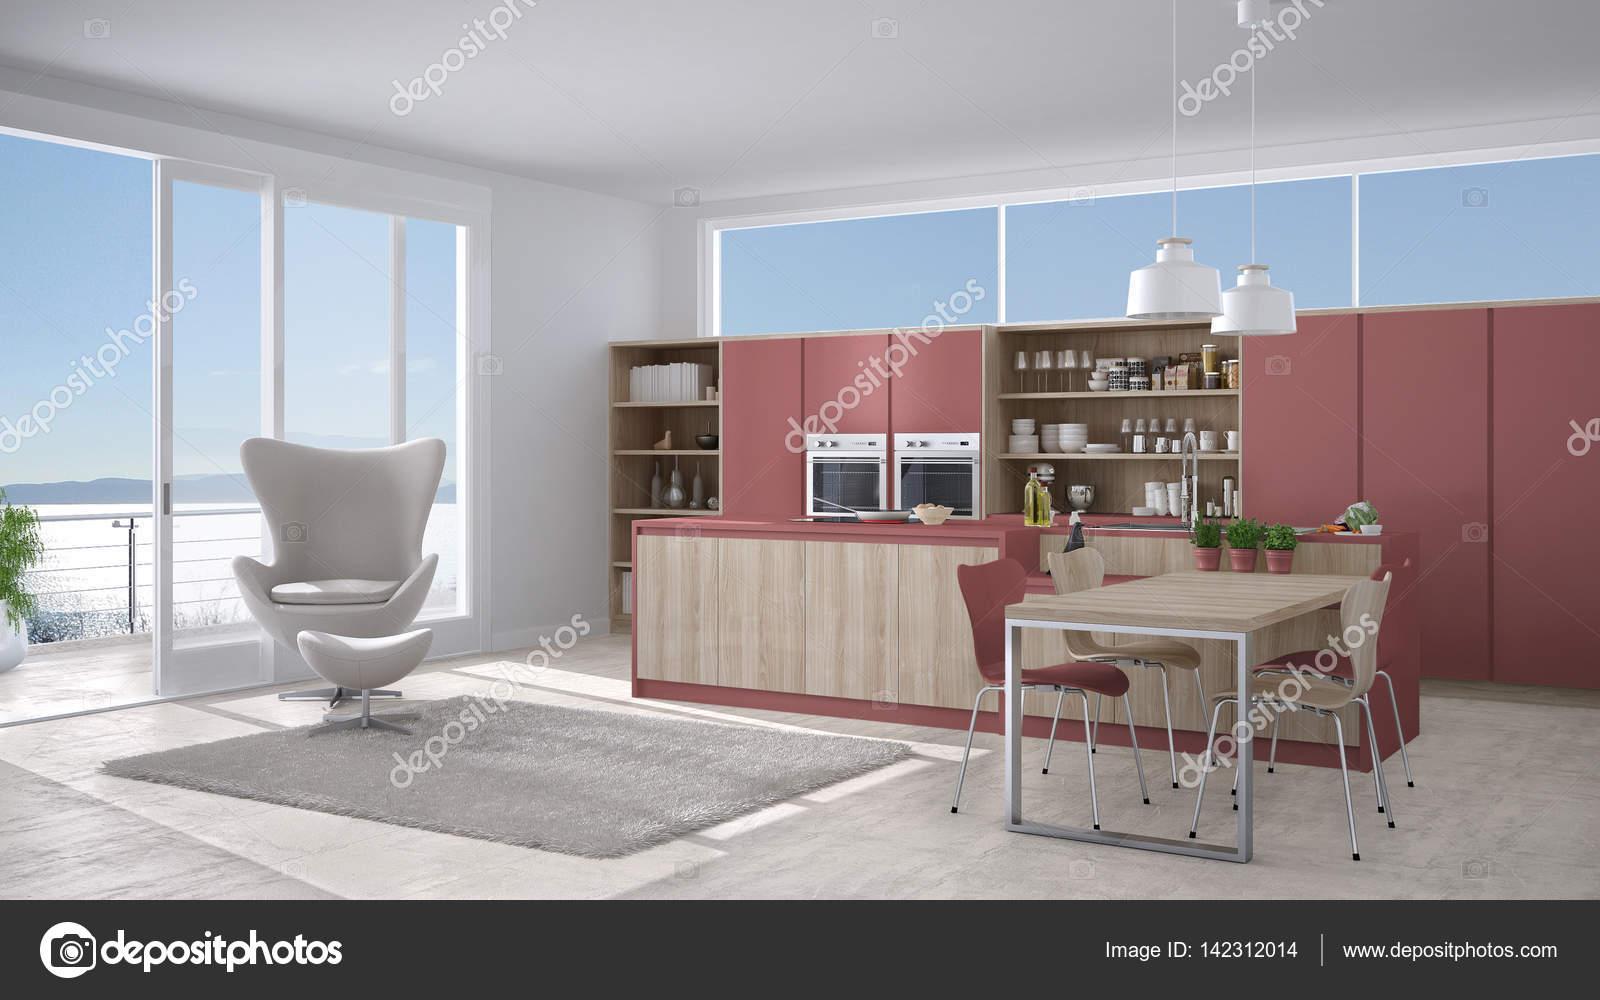 https://st3.depositphotos.com/1152281/14231/i/1600/depositphotos_142312014-stock-photo-modern-white-and-red-kitchen.jpg